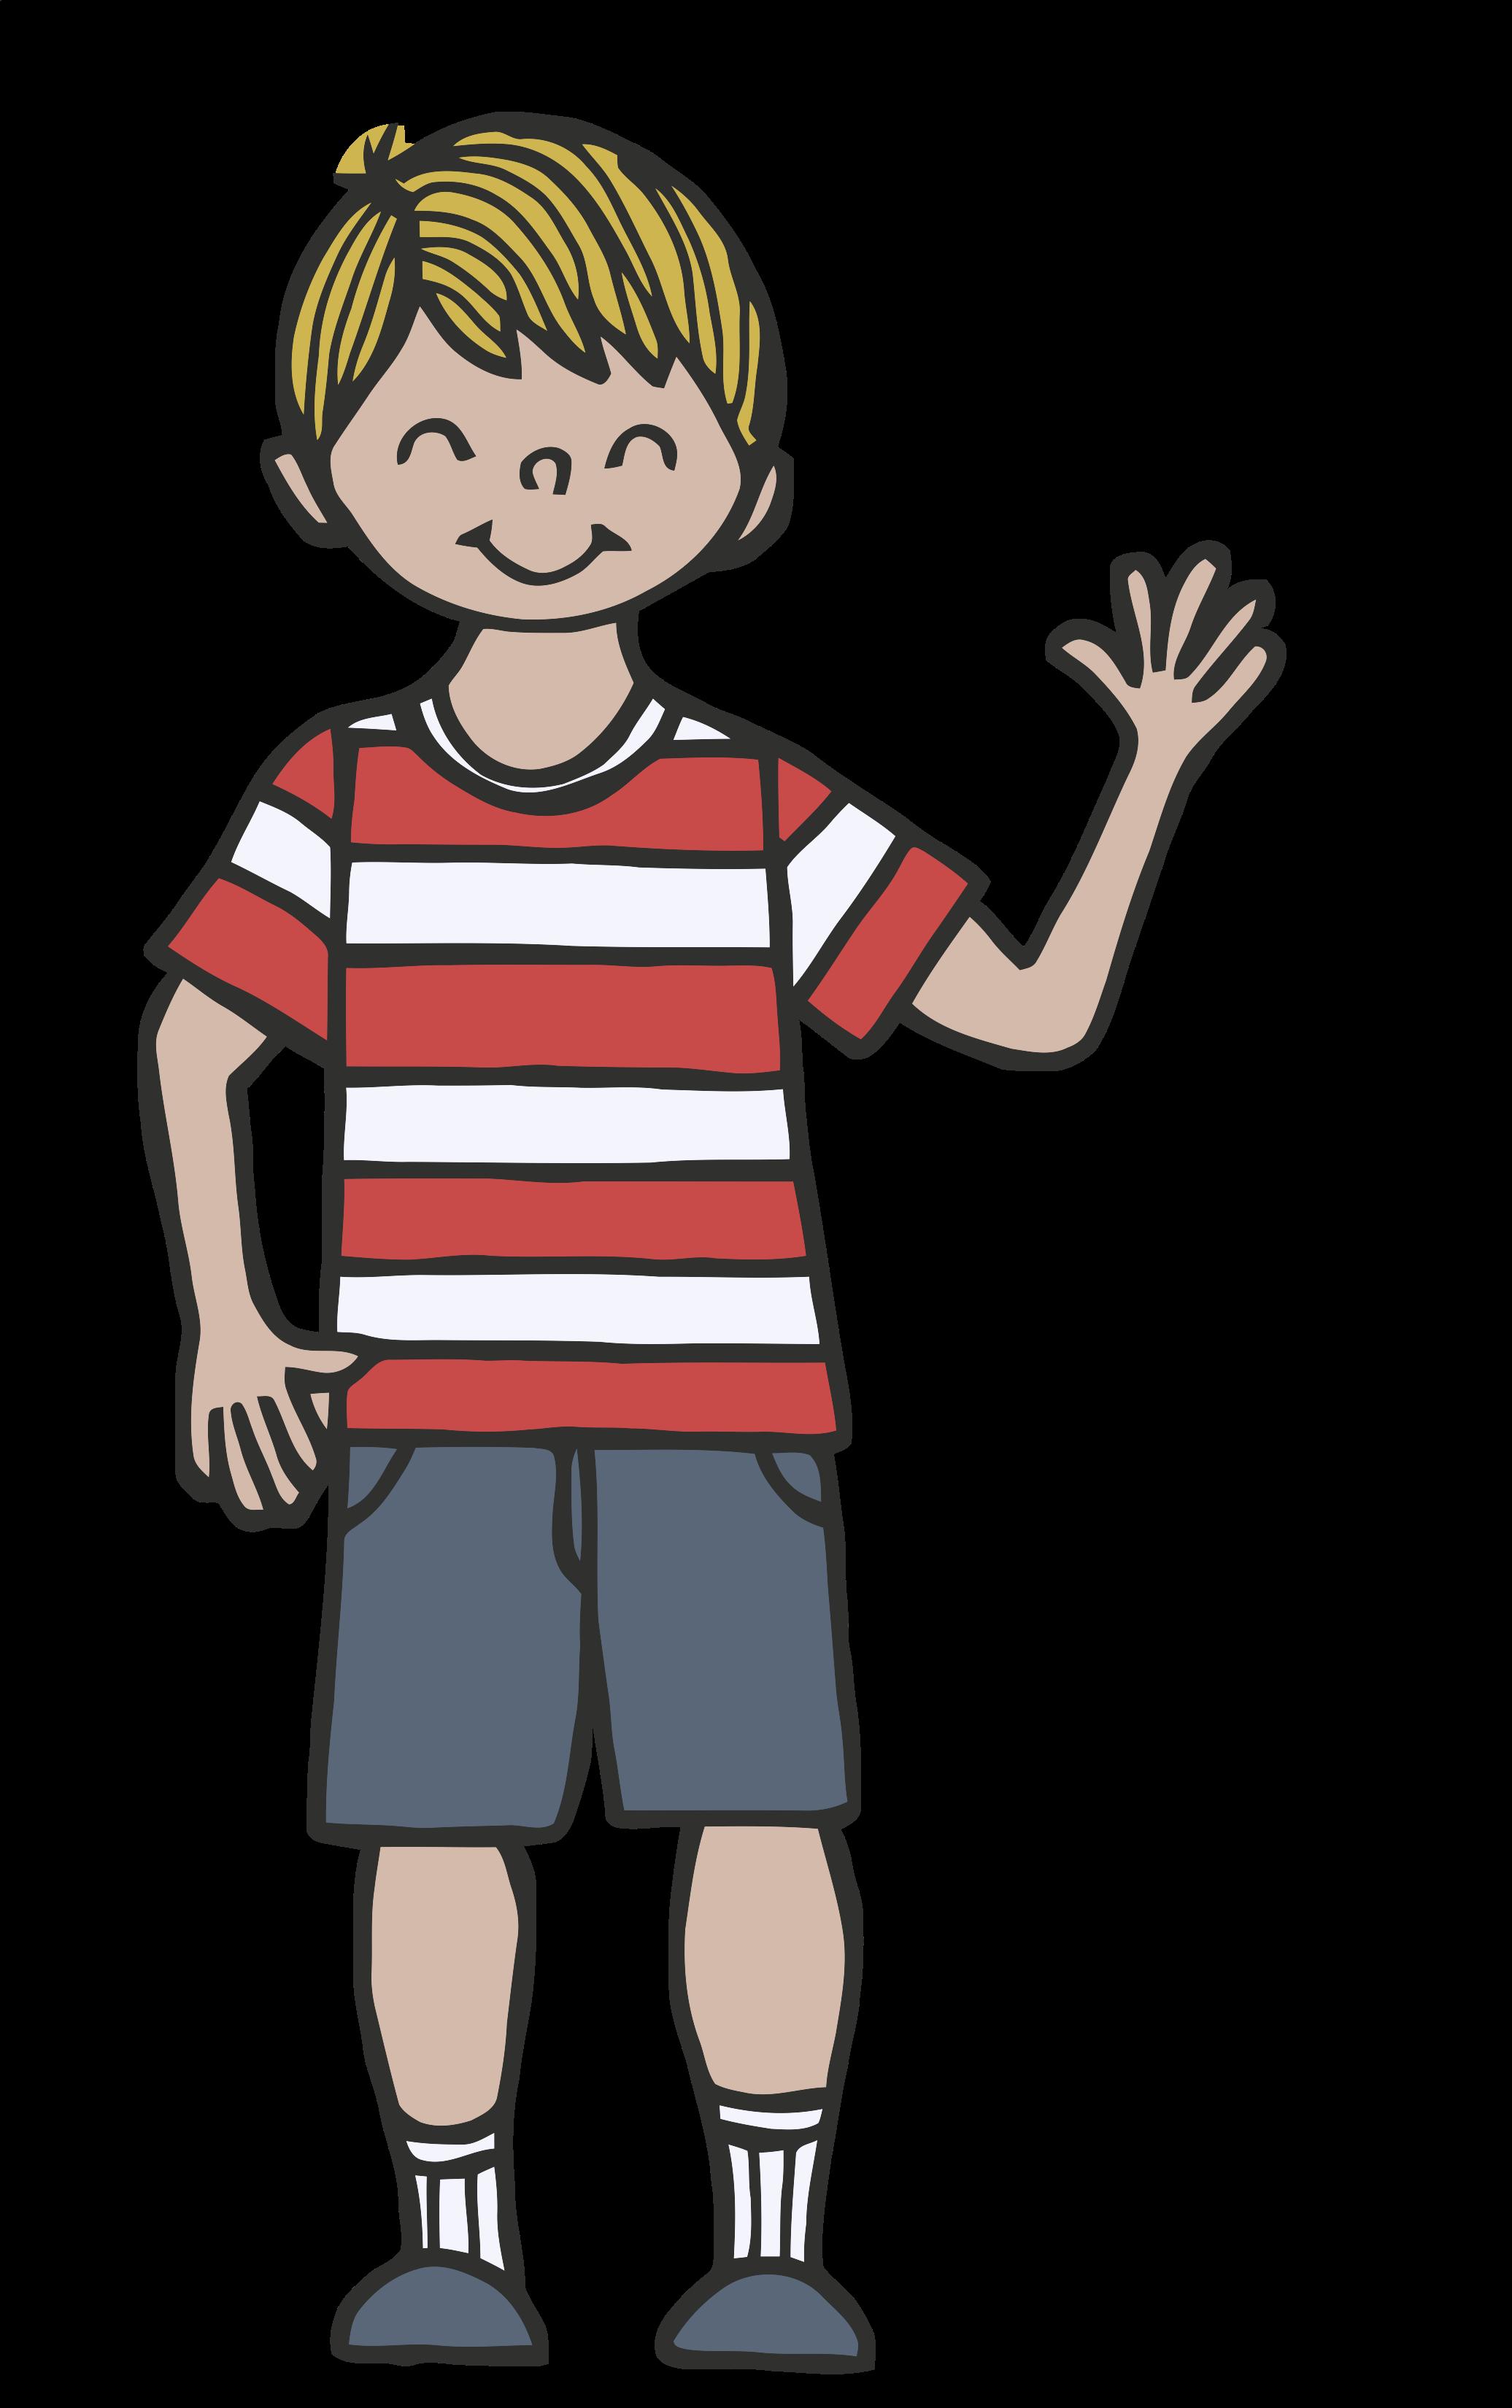 Child waving goodbye clipart